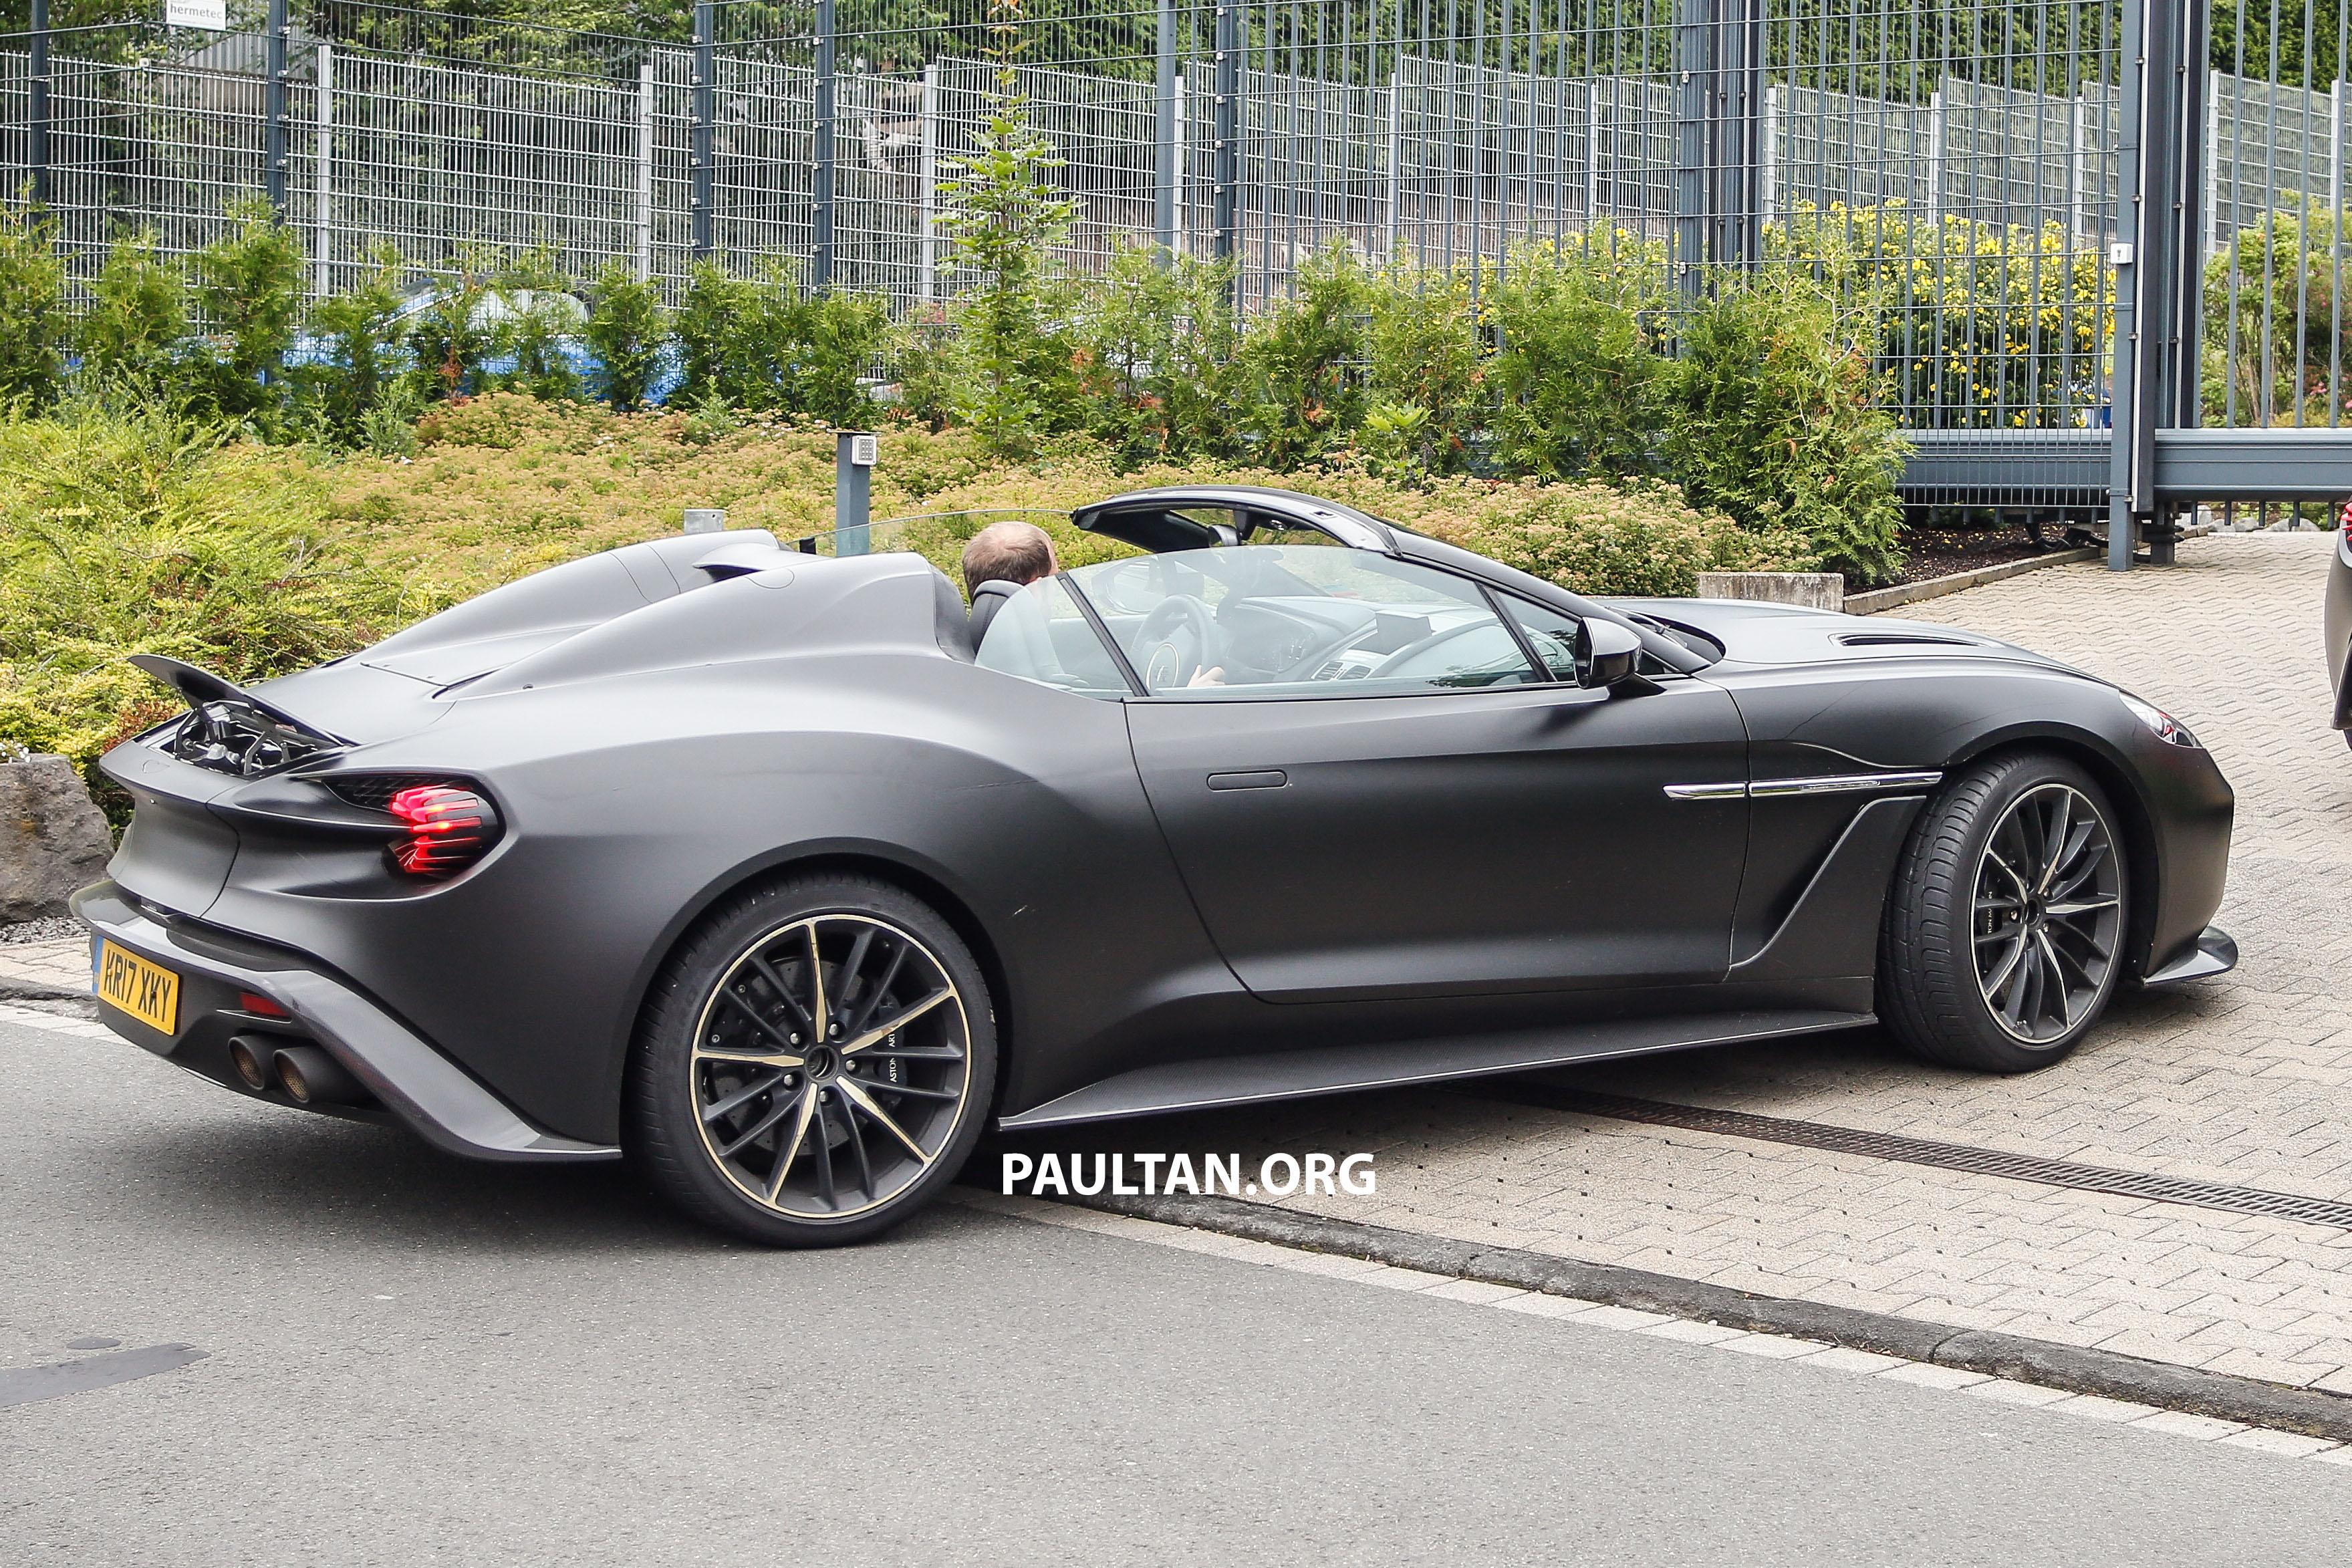 SPIED: Aston Martin Vanquish Zagato Volante and Vanquish ...